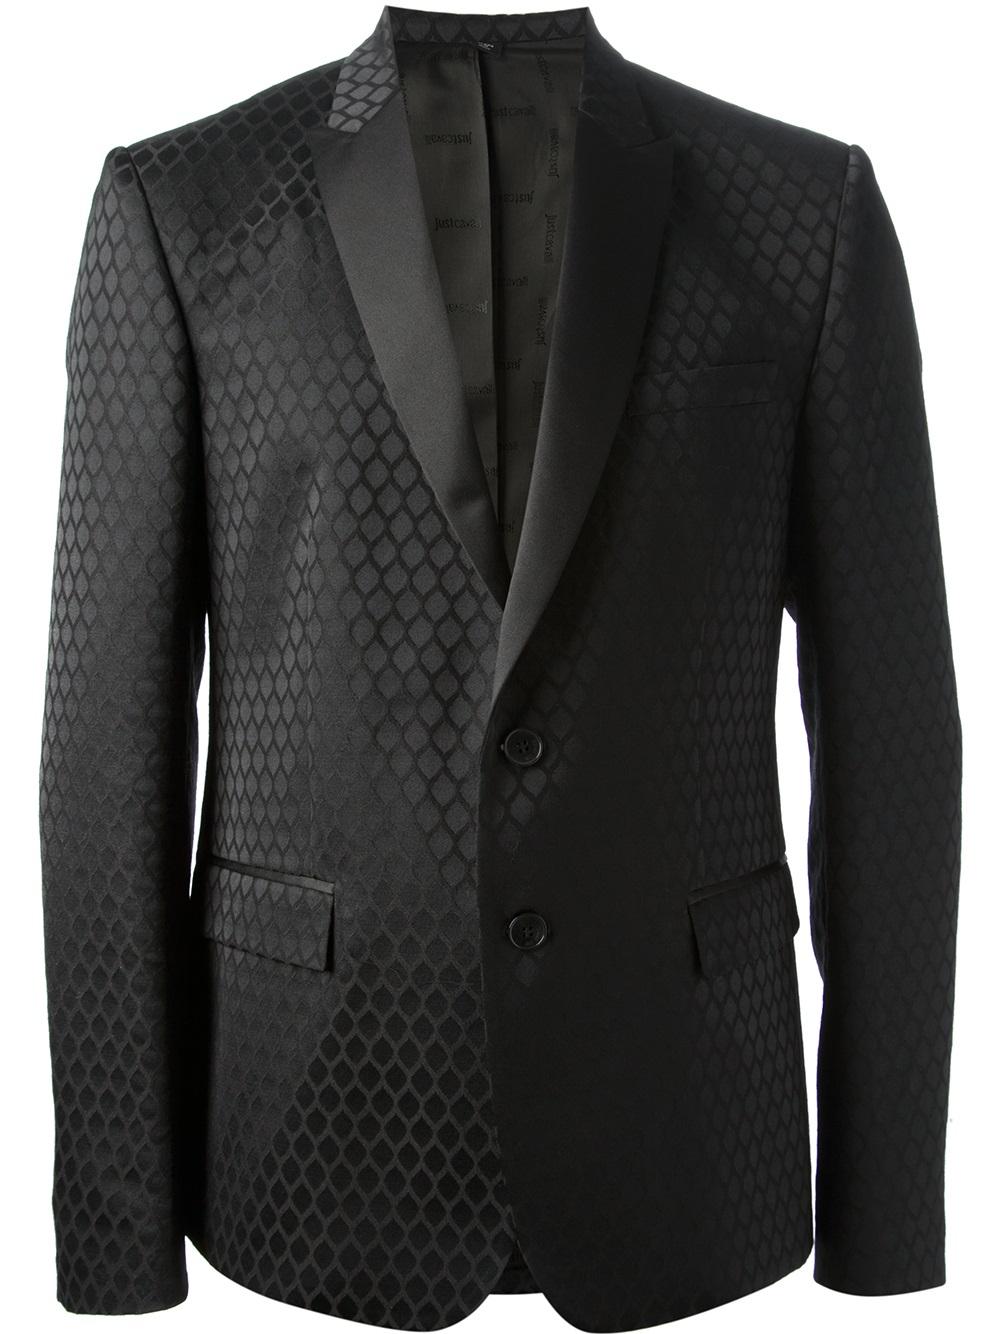 Lyst - Just Cavalli Devore Diamond Pattern Suit in Black ...